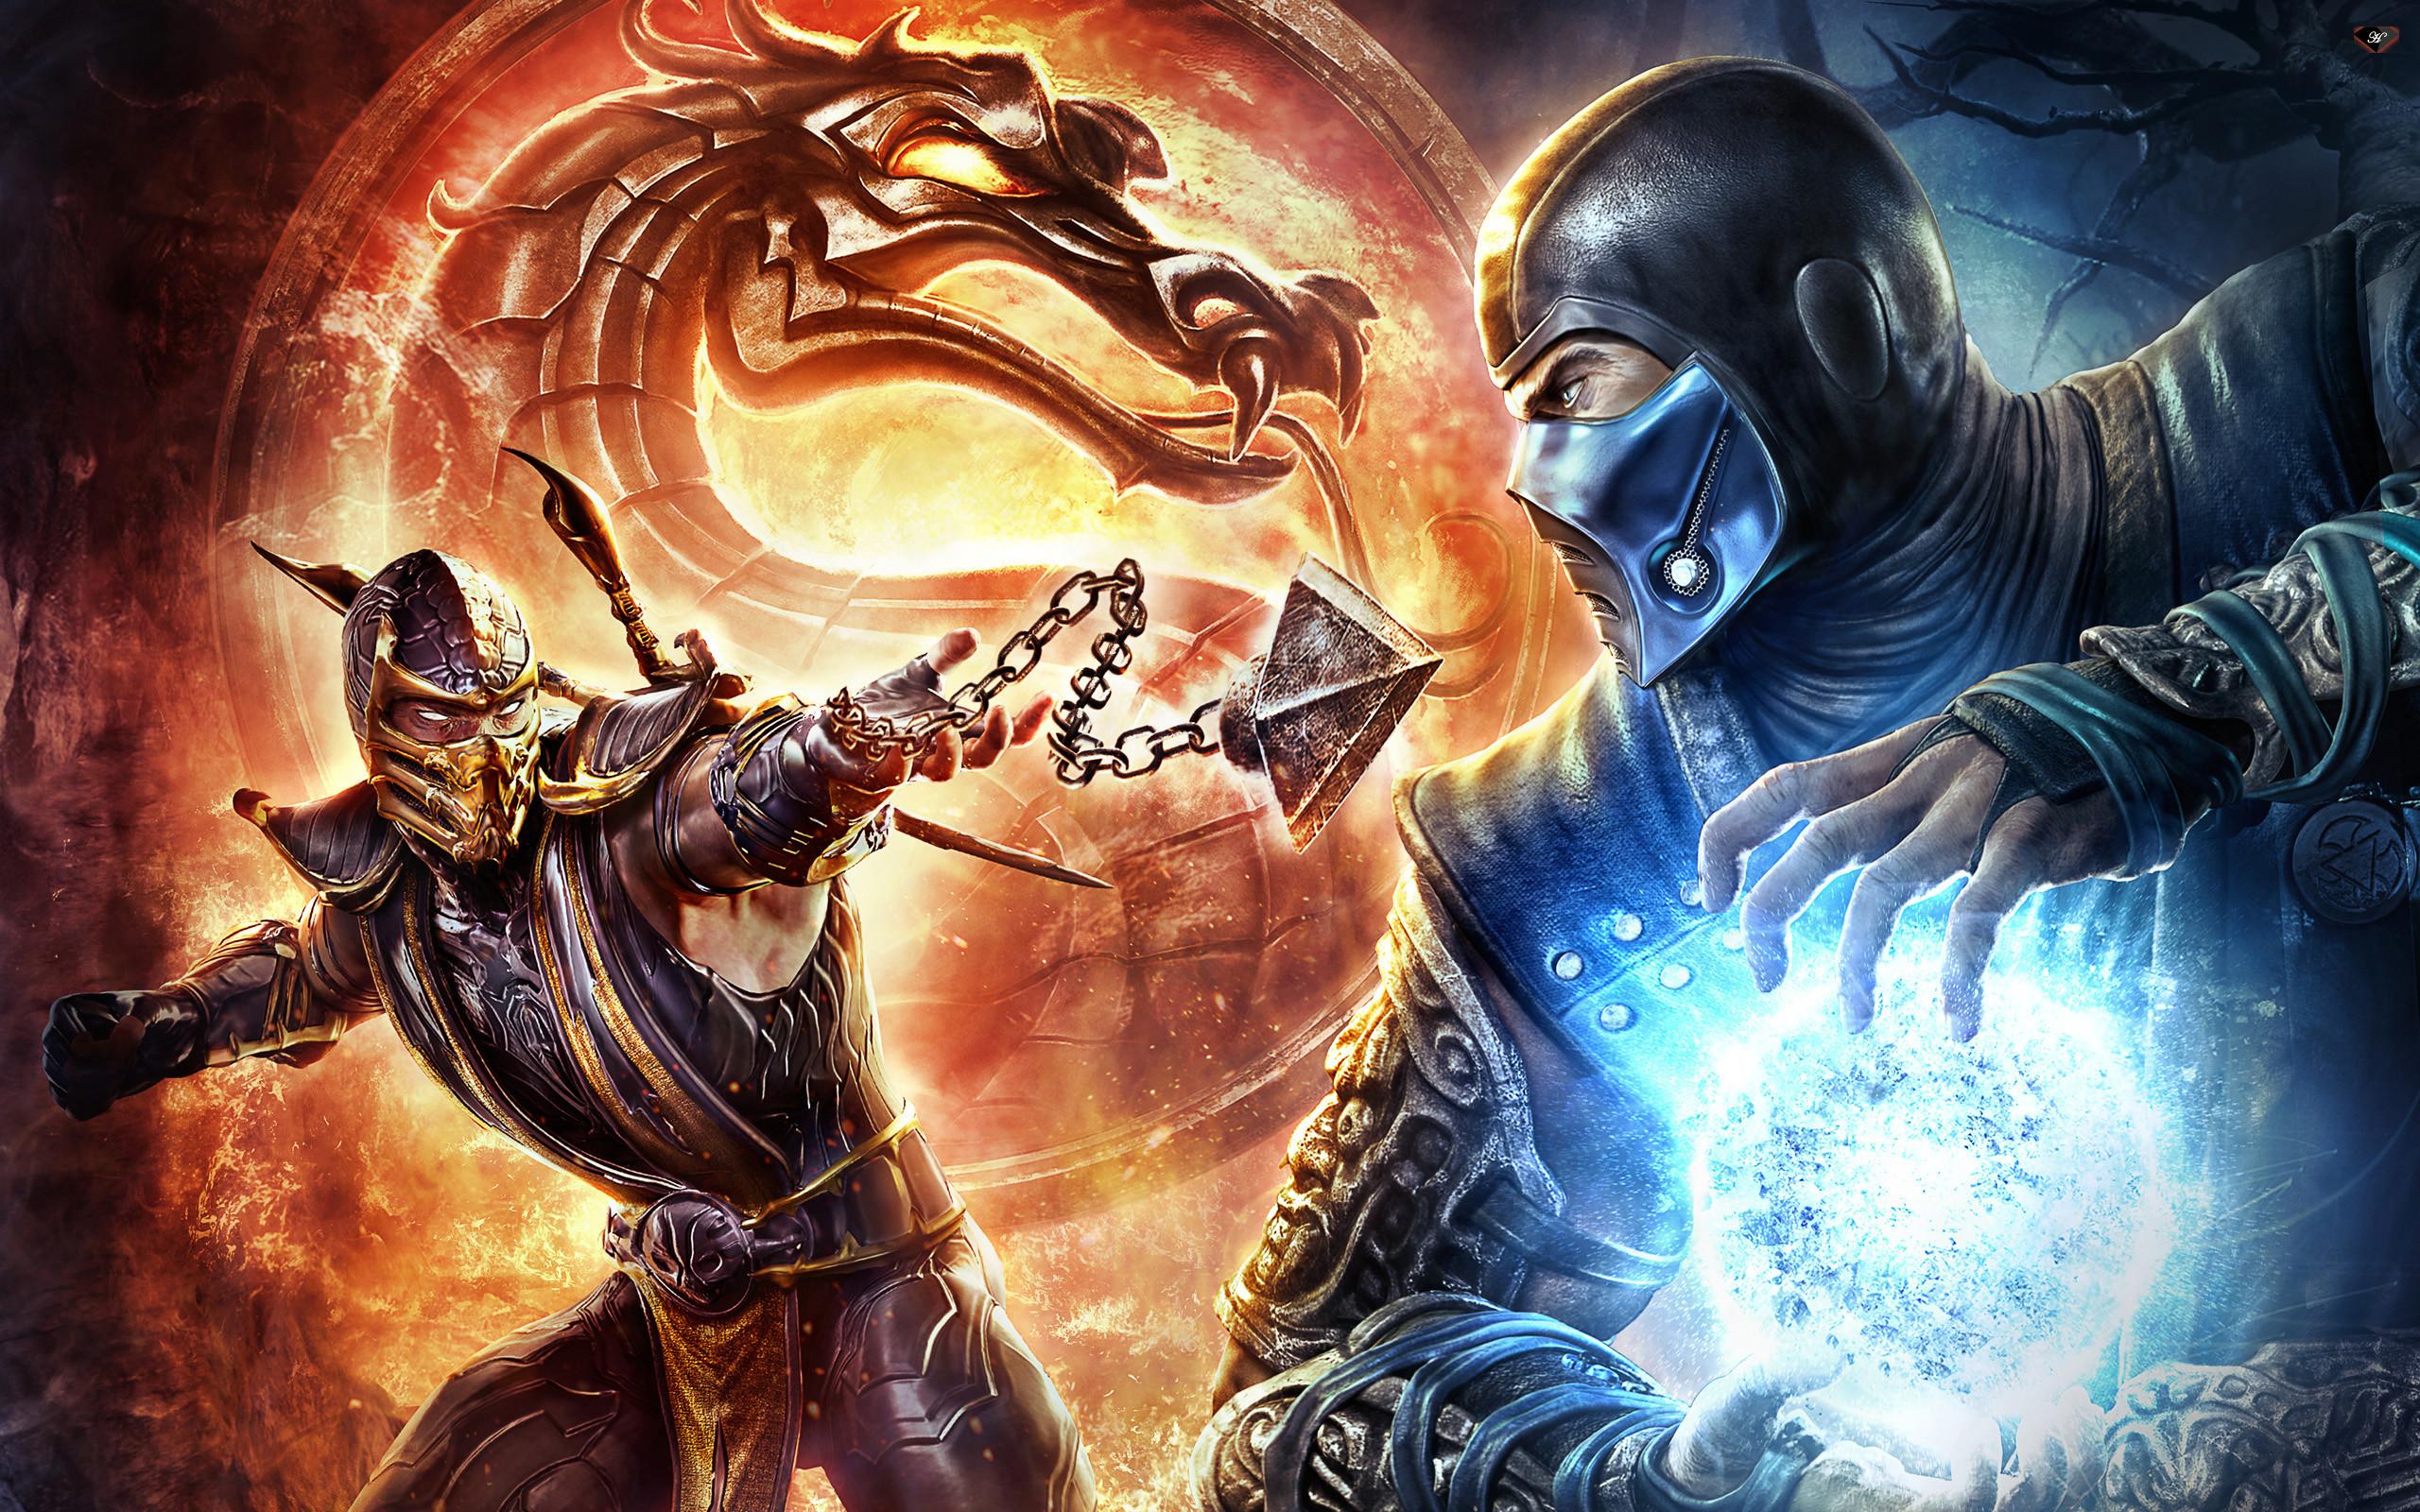 Mortal Kombat Wallpaper Hd Wallpapertag